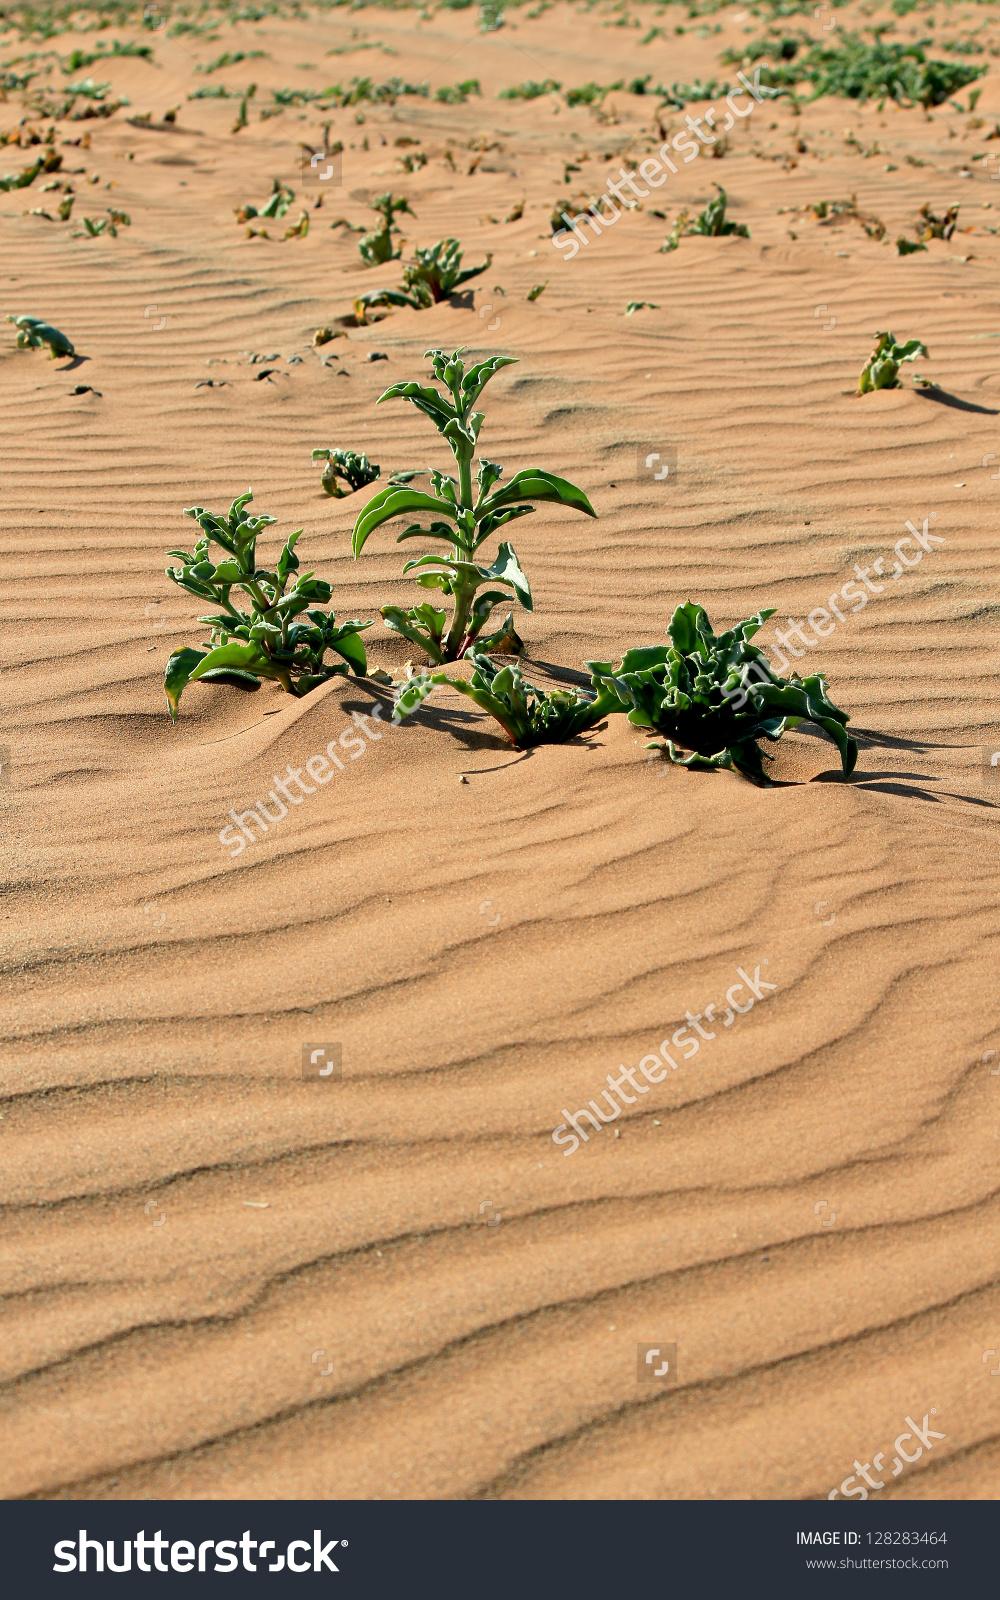 Xerophytic Plant Sandy Namib Desert South Stock Photo 128283464.